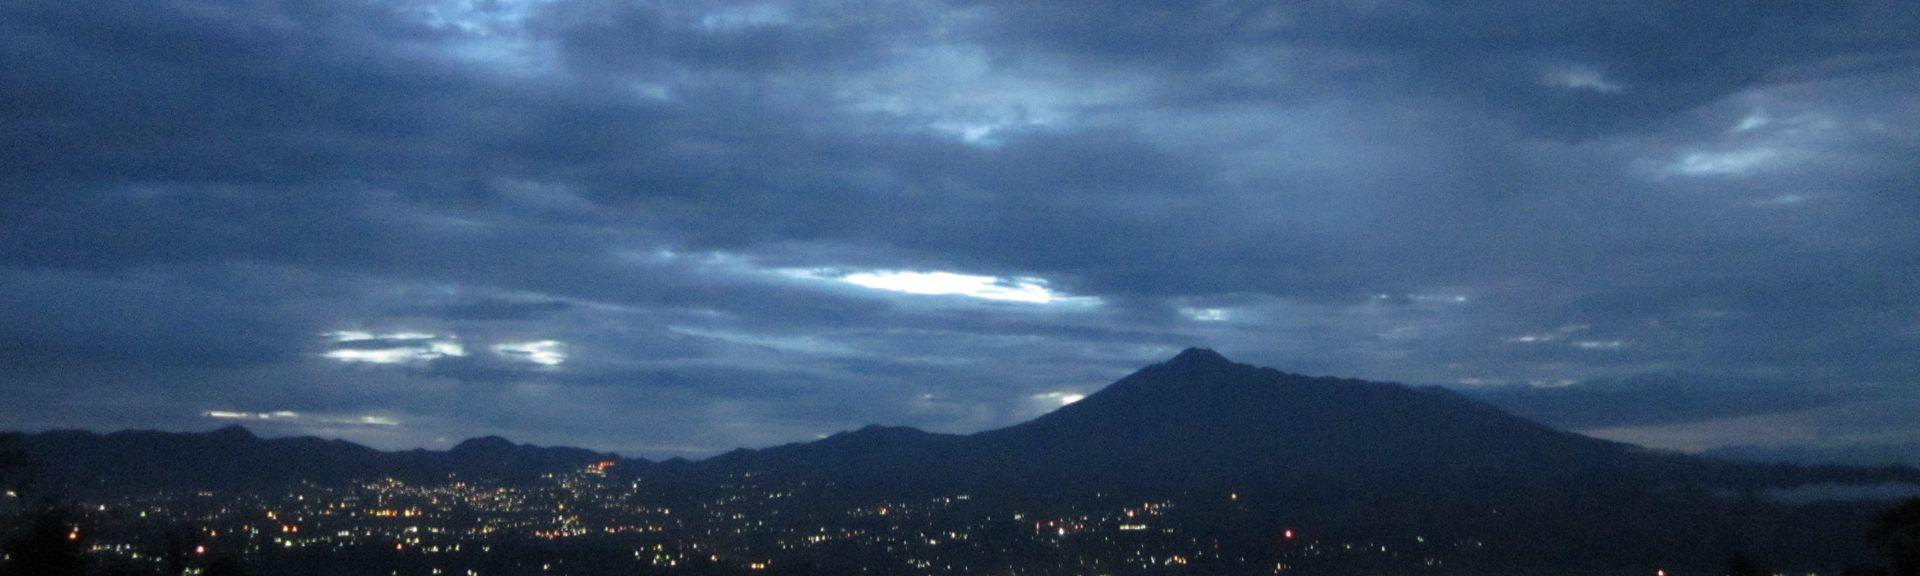 Sentul City, Java occidental, Indonésie